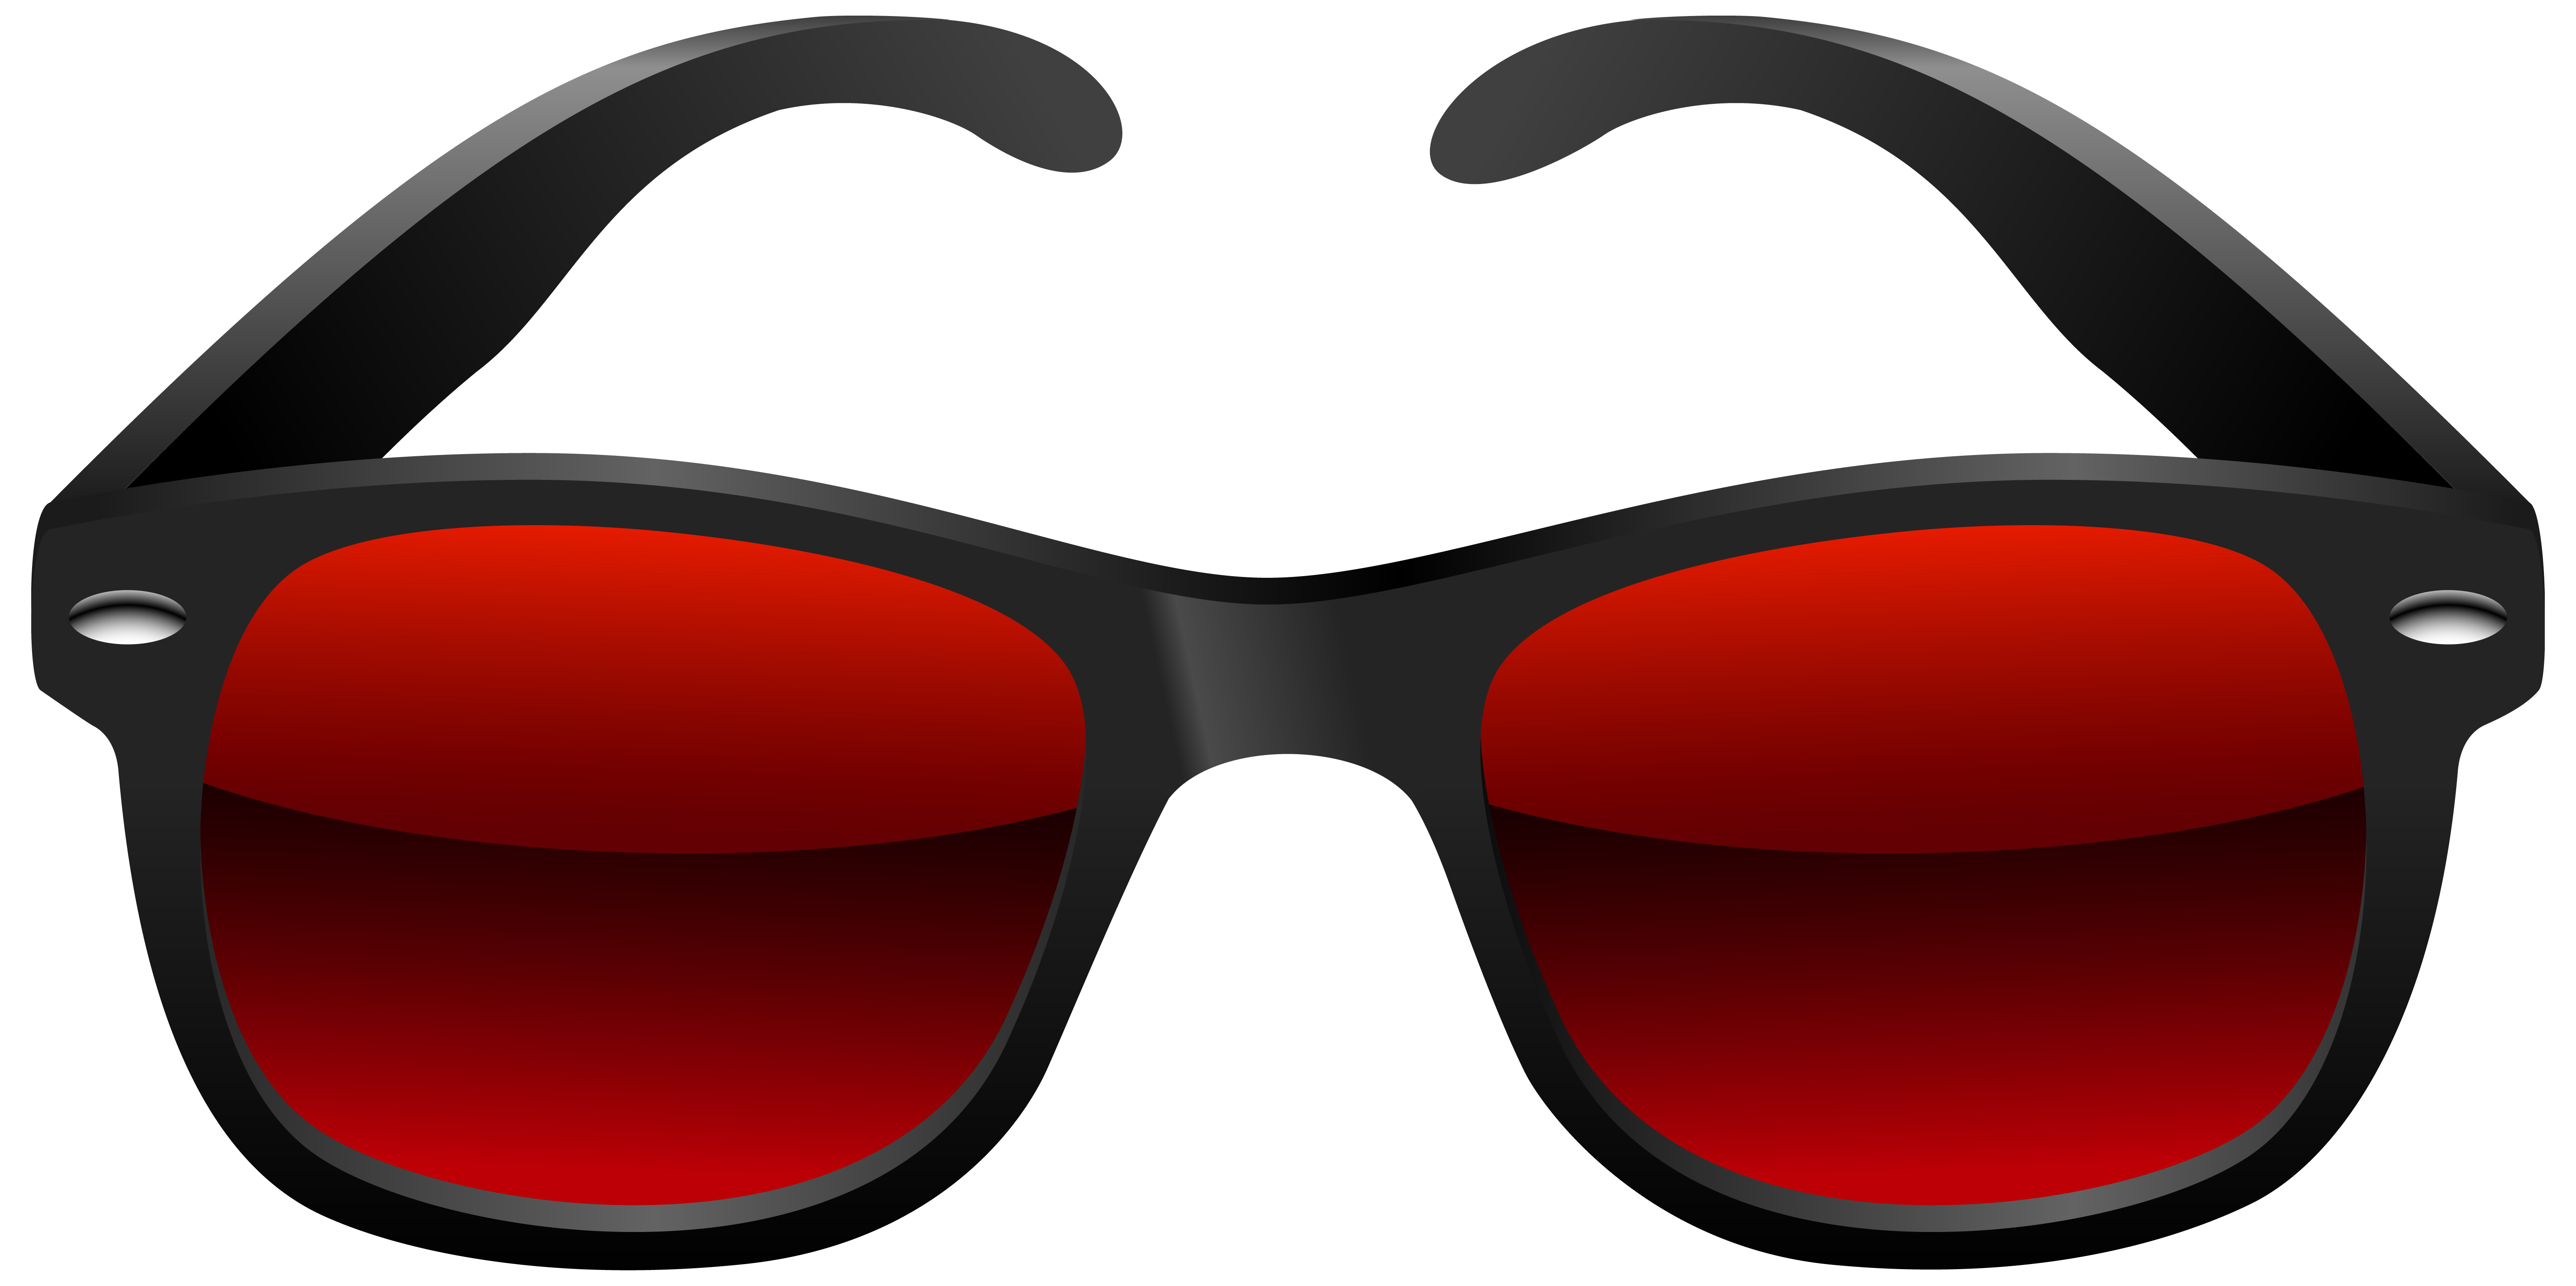 6105x3047 Glass Clipart Chasma